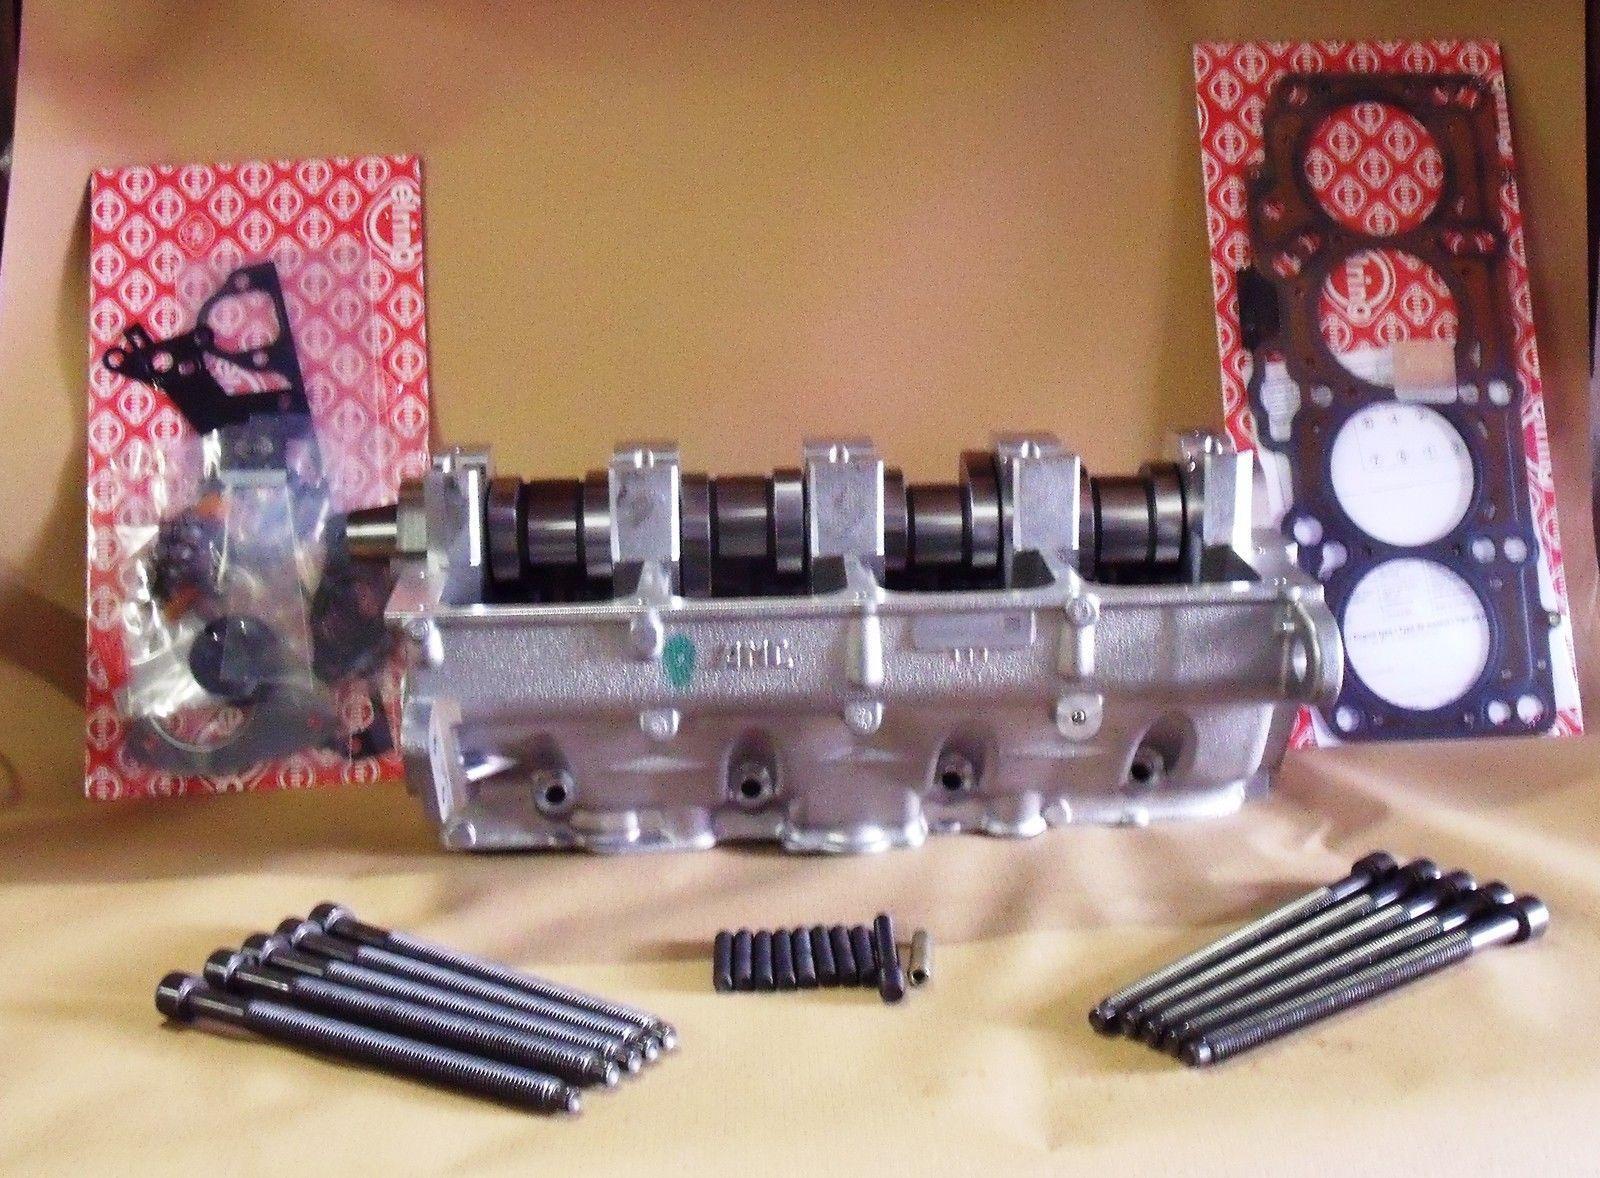 VW Audi Diesel Cylinder Heads - AW Shop